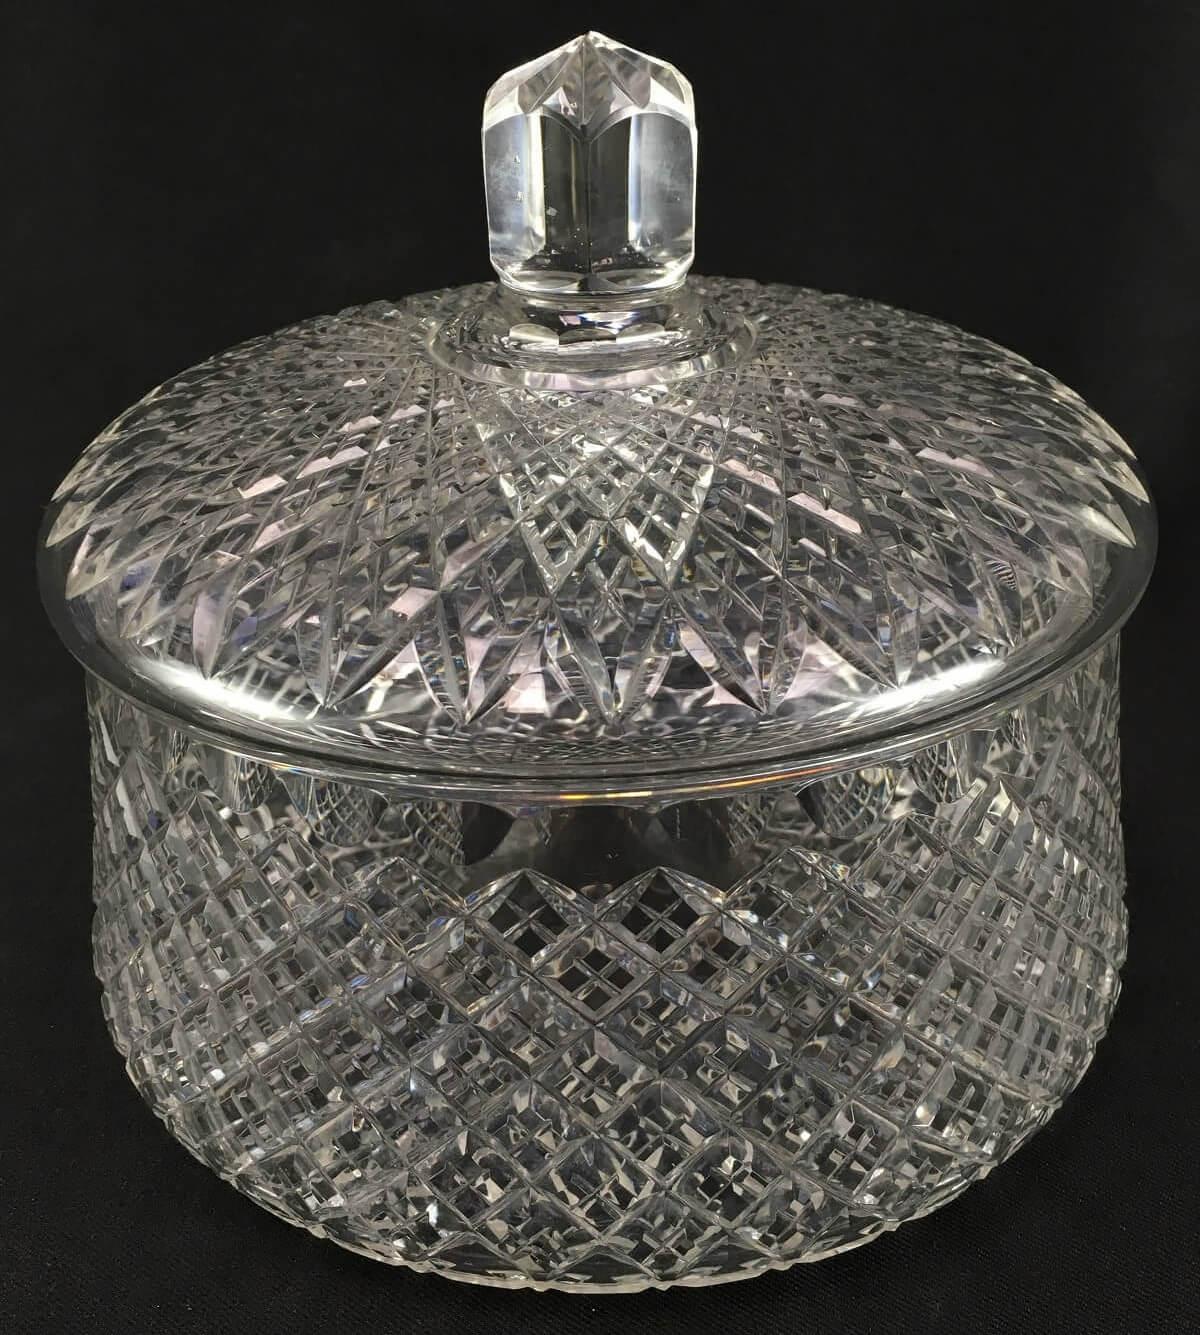 Antiga Bomboniere Cristal Europeu Lapidado